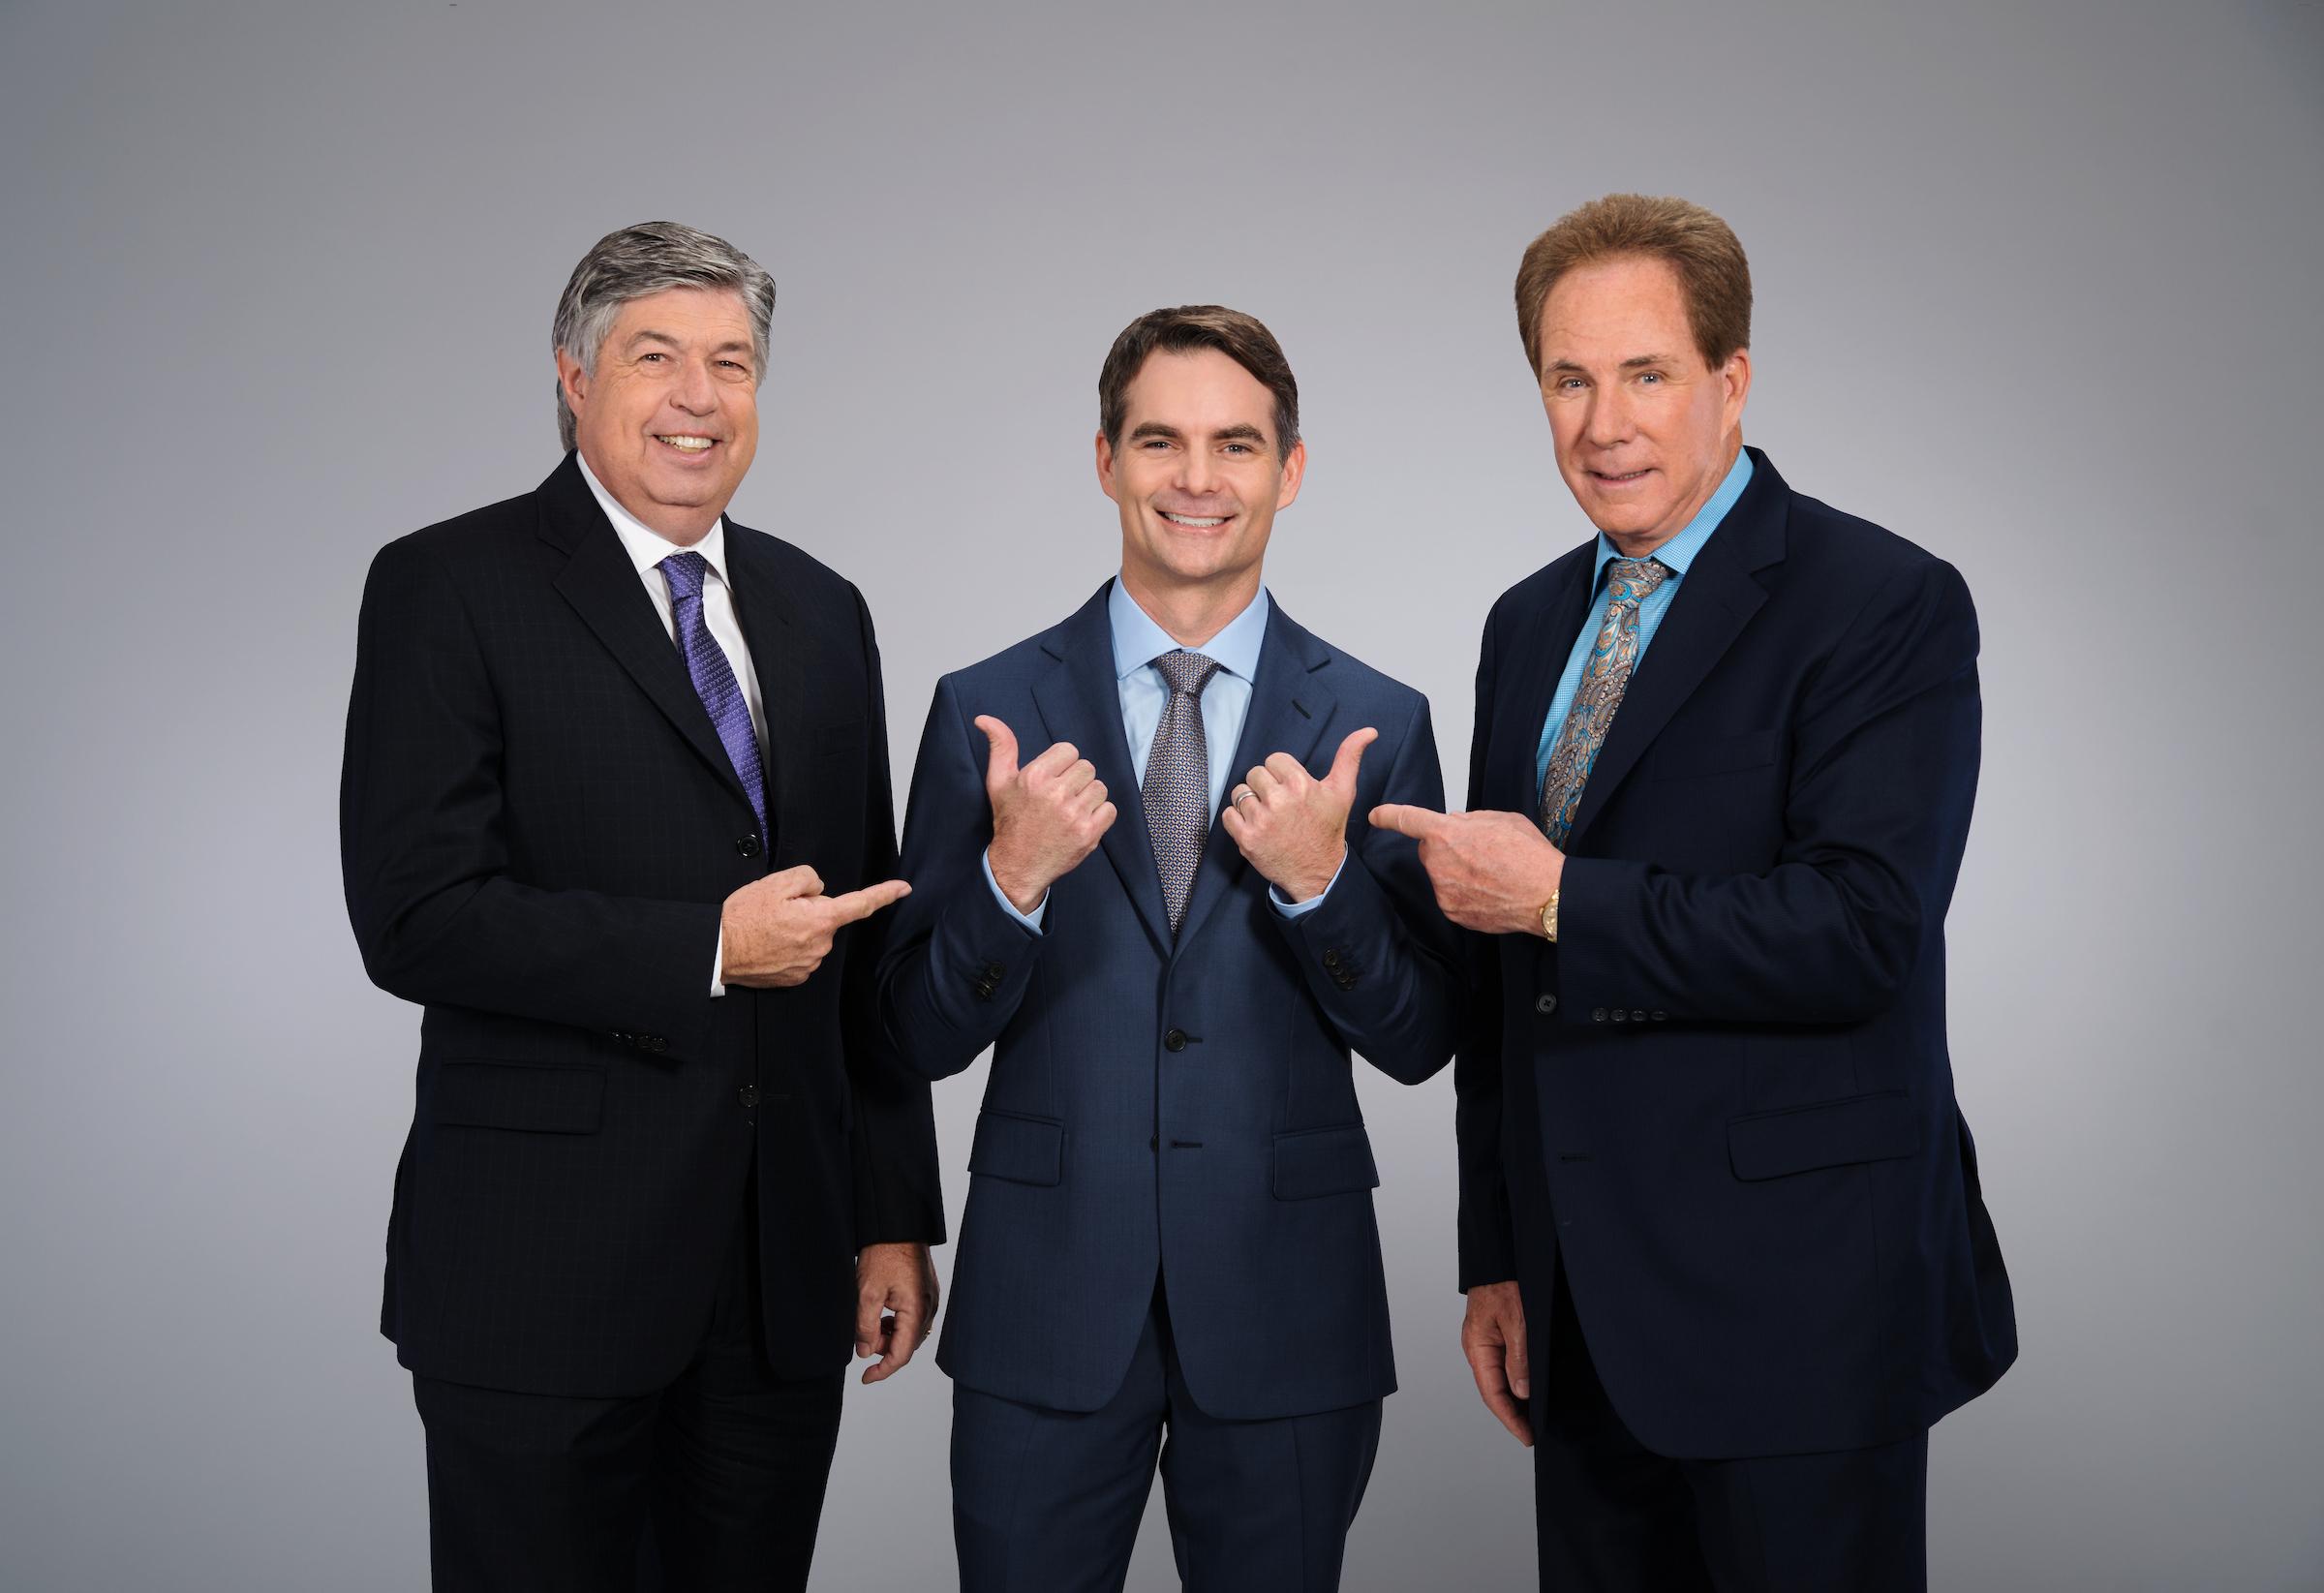 Mike-Joy-Jeff-Gordon-Darrell-Waltrip